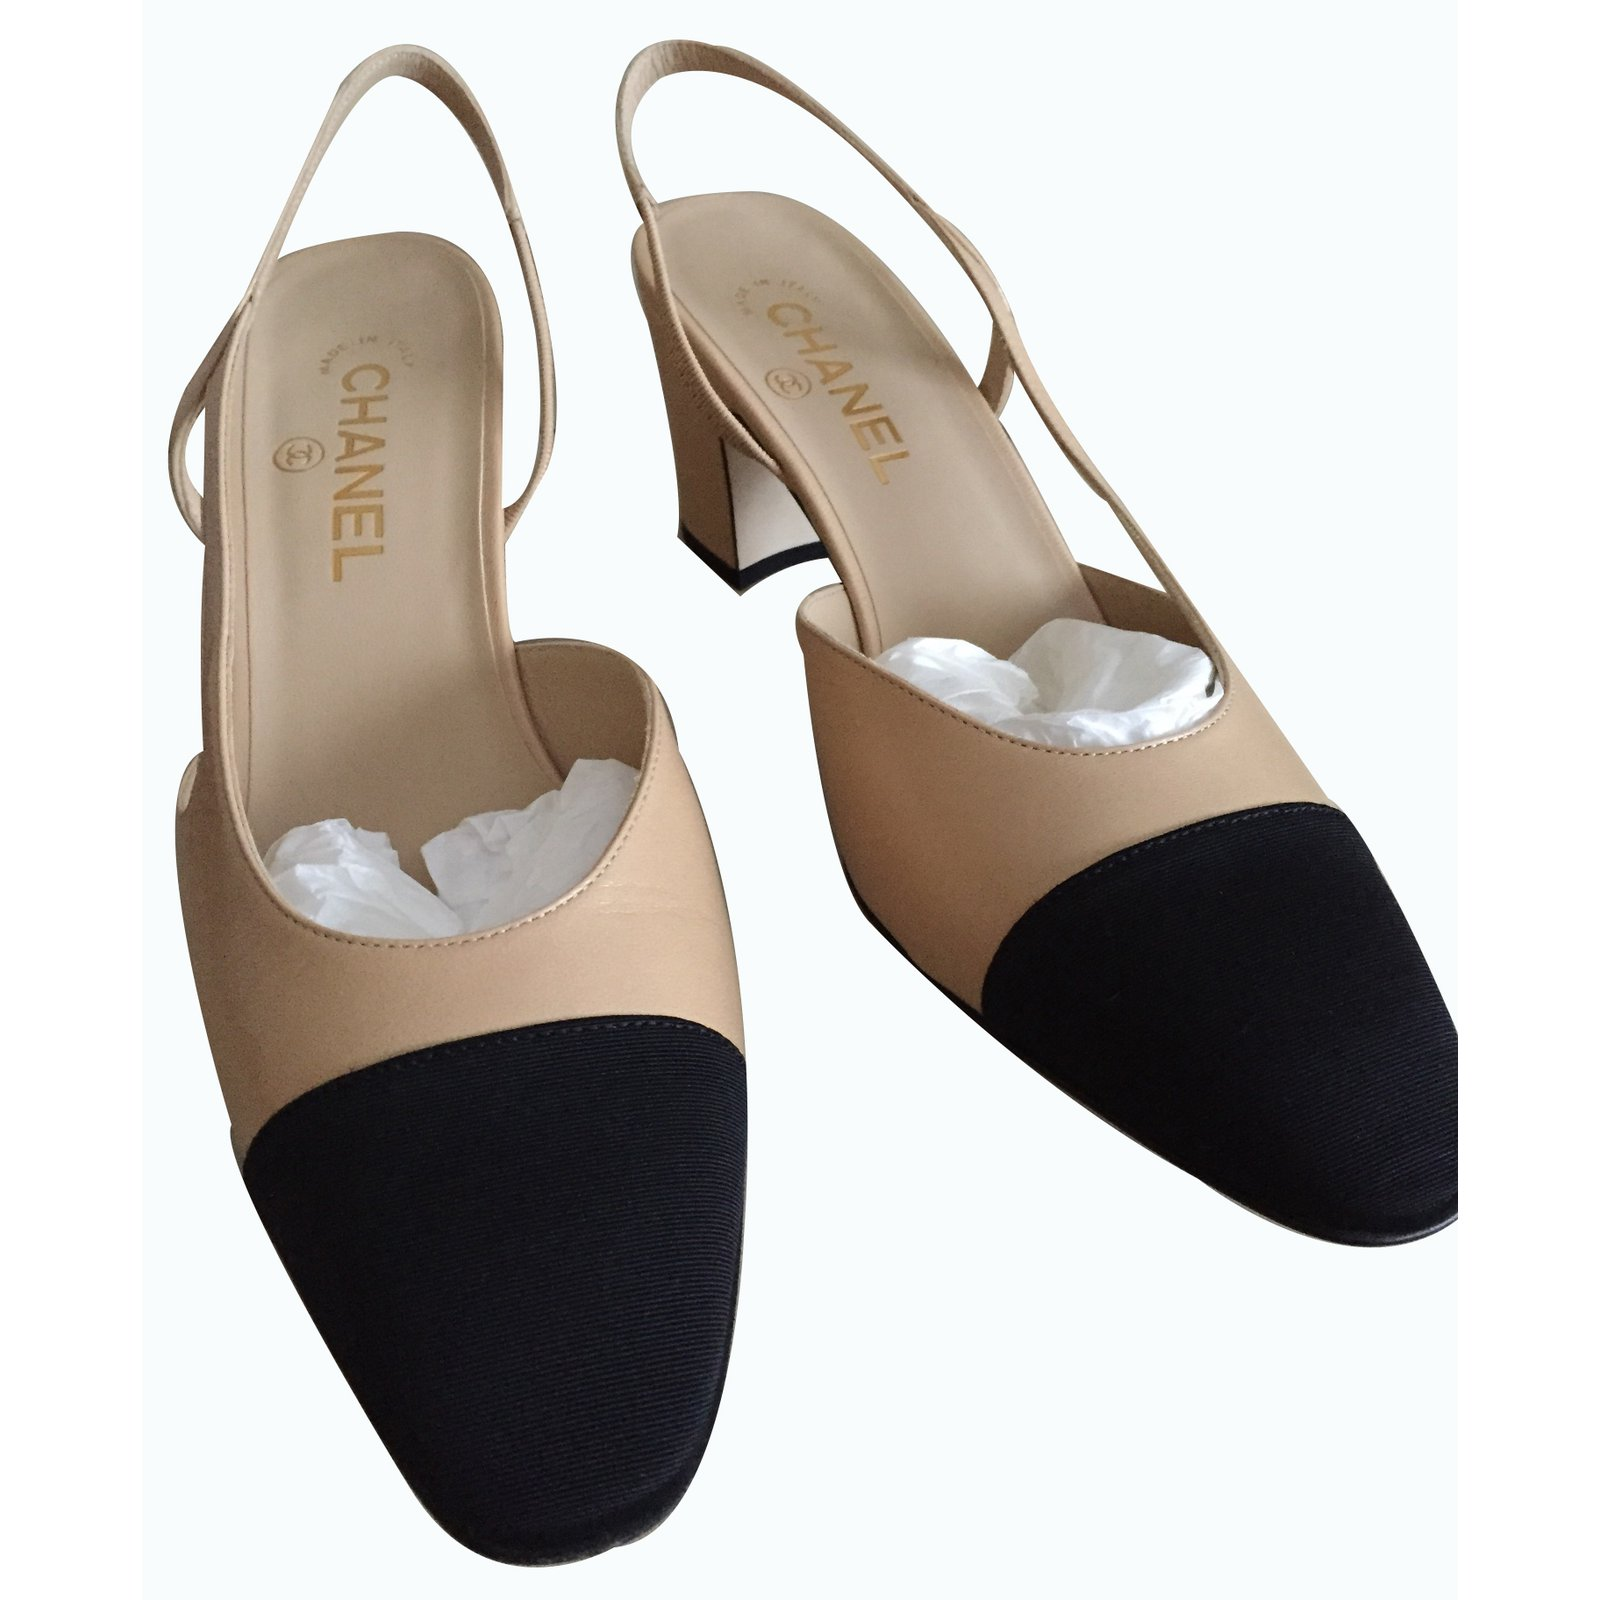 Escarpins Chanel Slingback Cuir Beige Ref 16026 Joli Closet